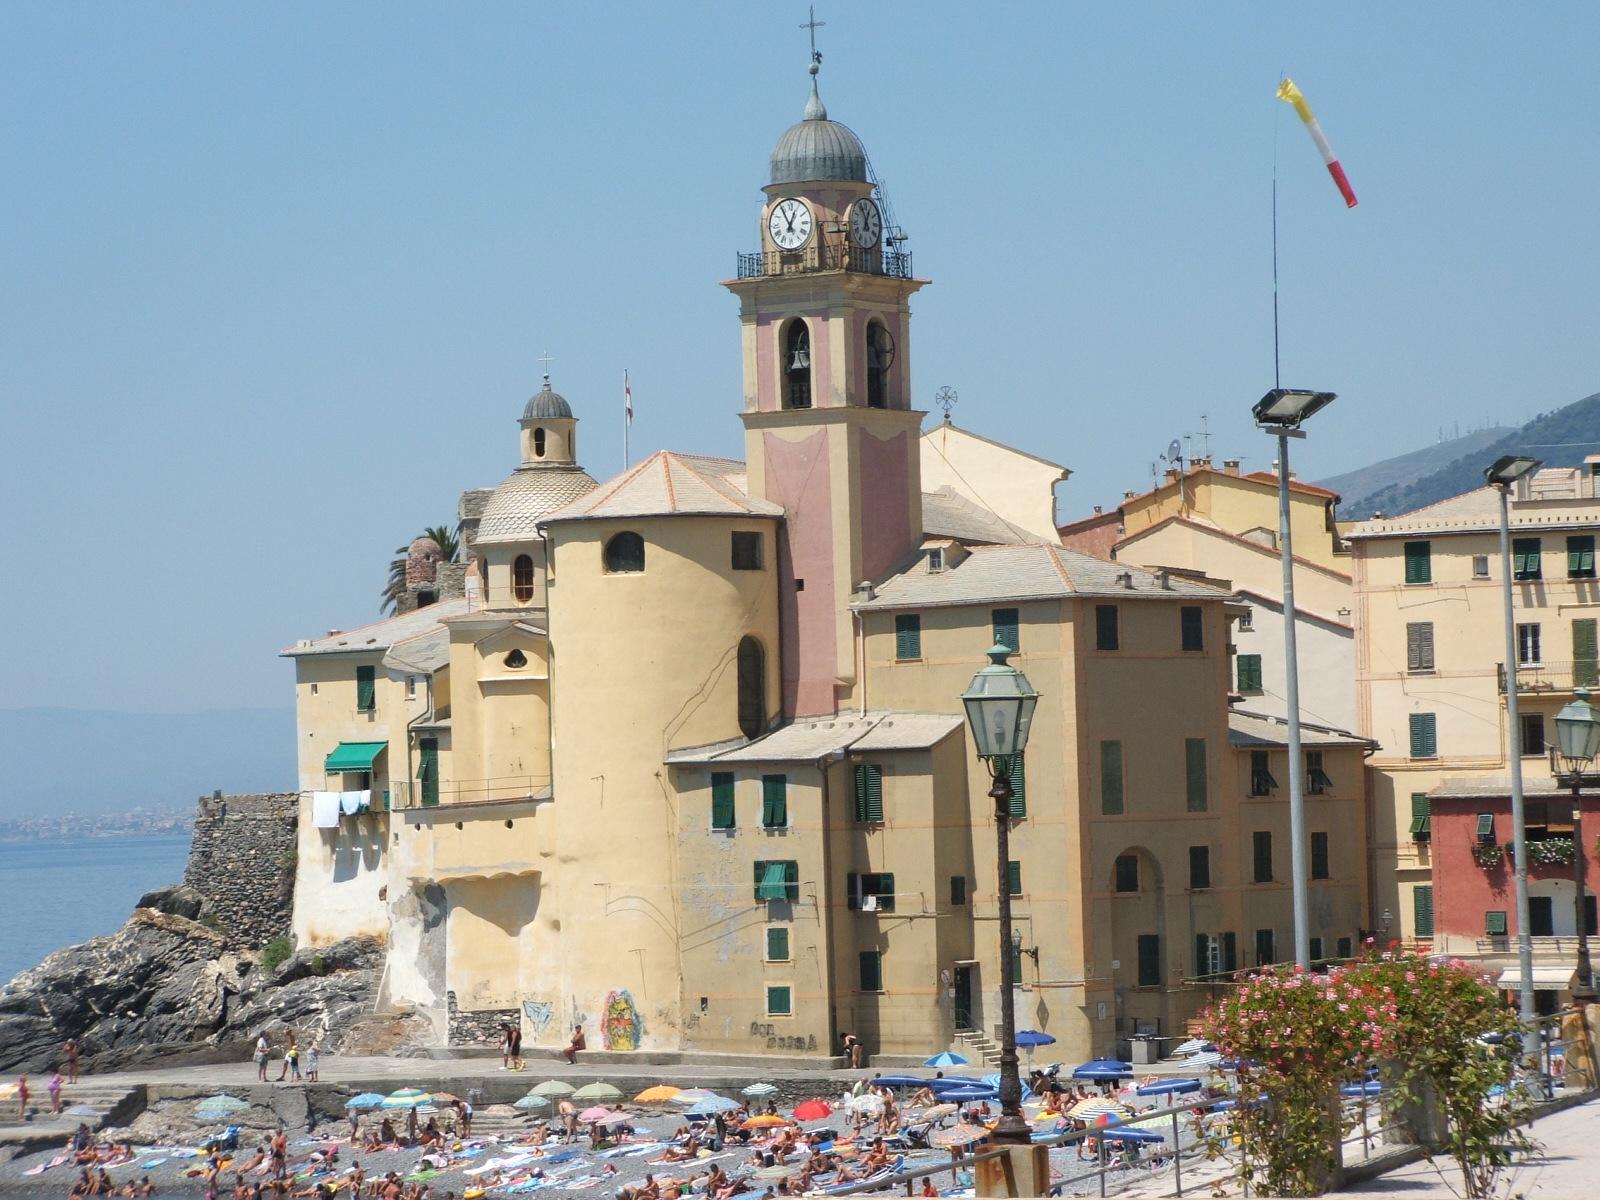 Camogli-chiesa_di_Santa_Maria-DSCF0614